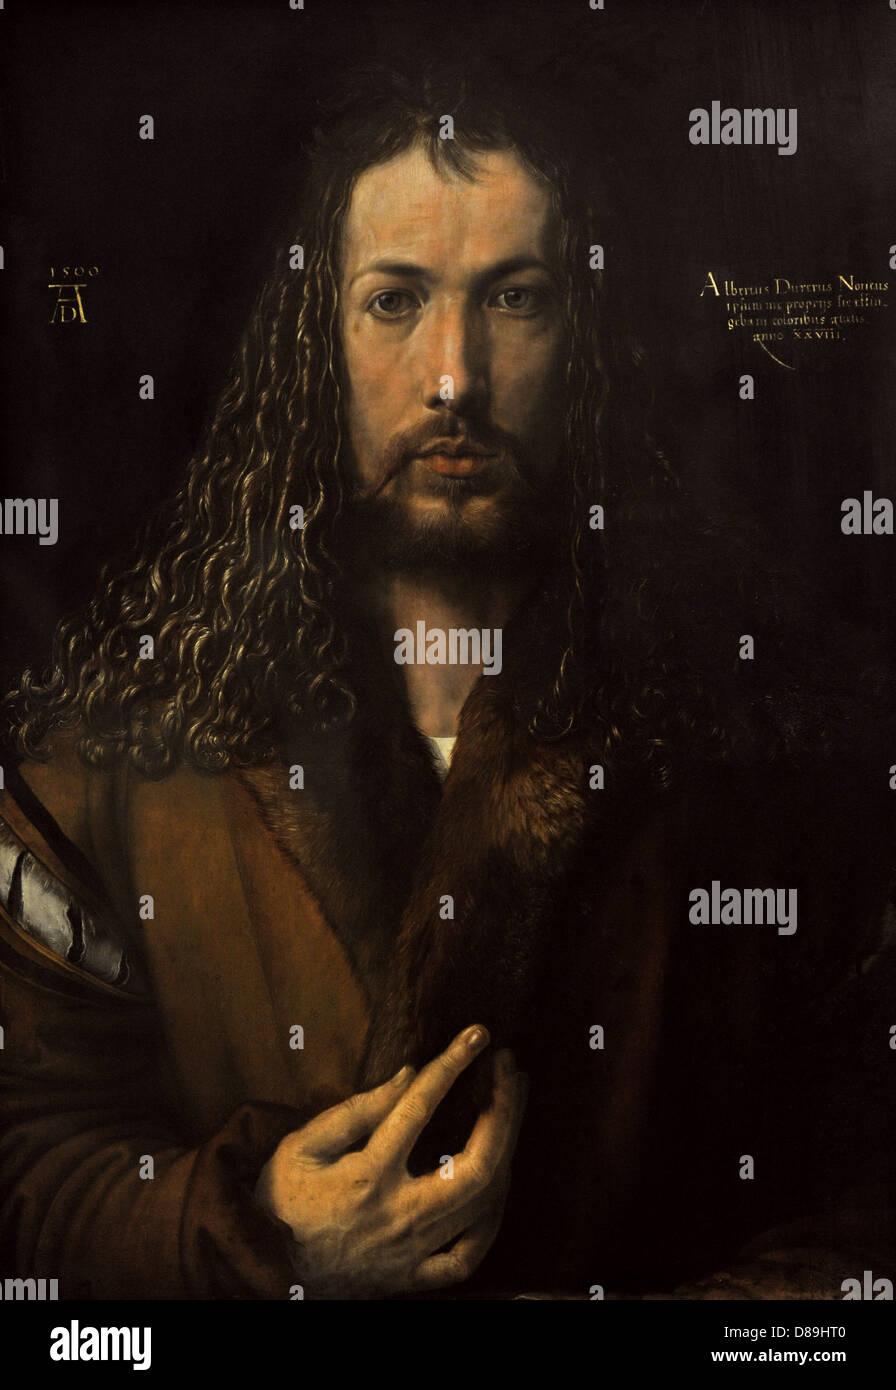 Albrecht Dürer ((1471 ? 1528) deutscher Maler. Selbstporträt (1500). Alte Pinakothek. München. Deutschland. Stockbild